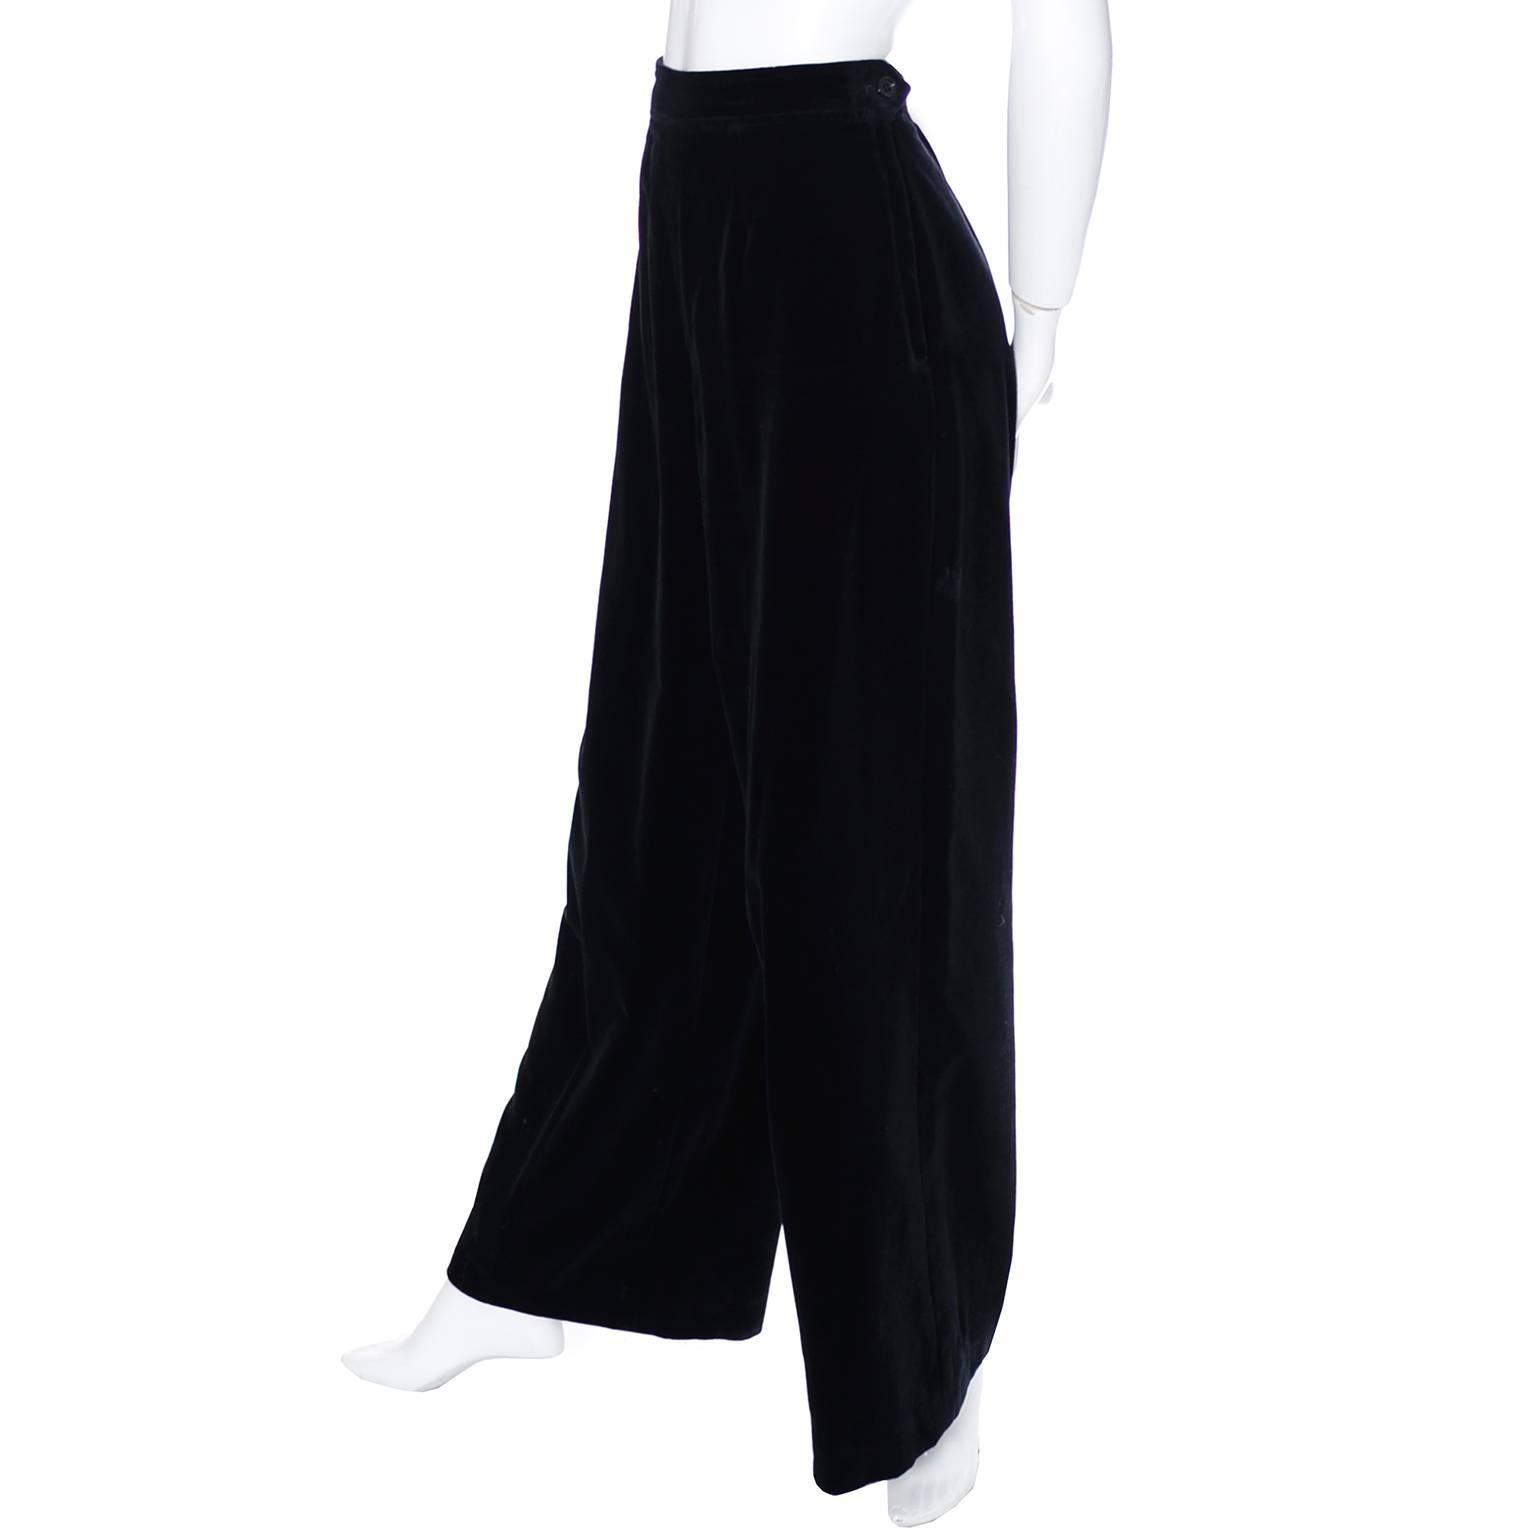 5298eb9b540 Vintage YSL Pants Black Velvet High Waisted Wide Saint Laurent Evening  Trousers For Sale at 1stdibs